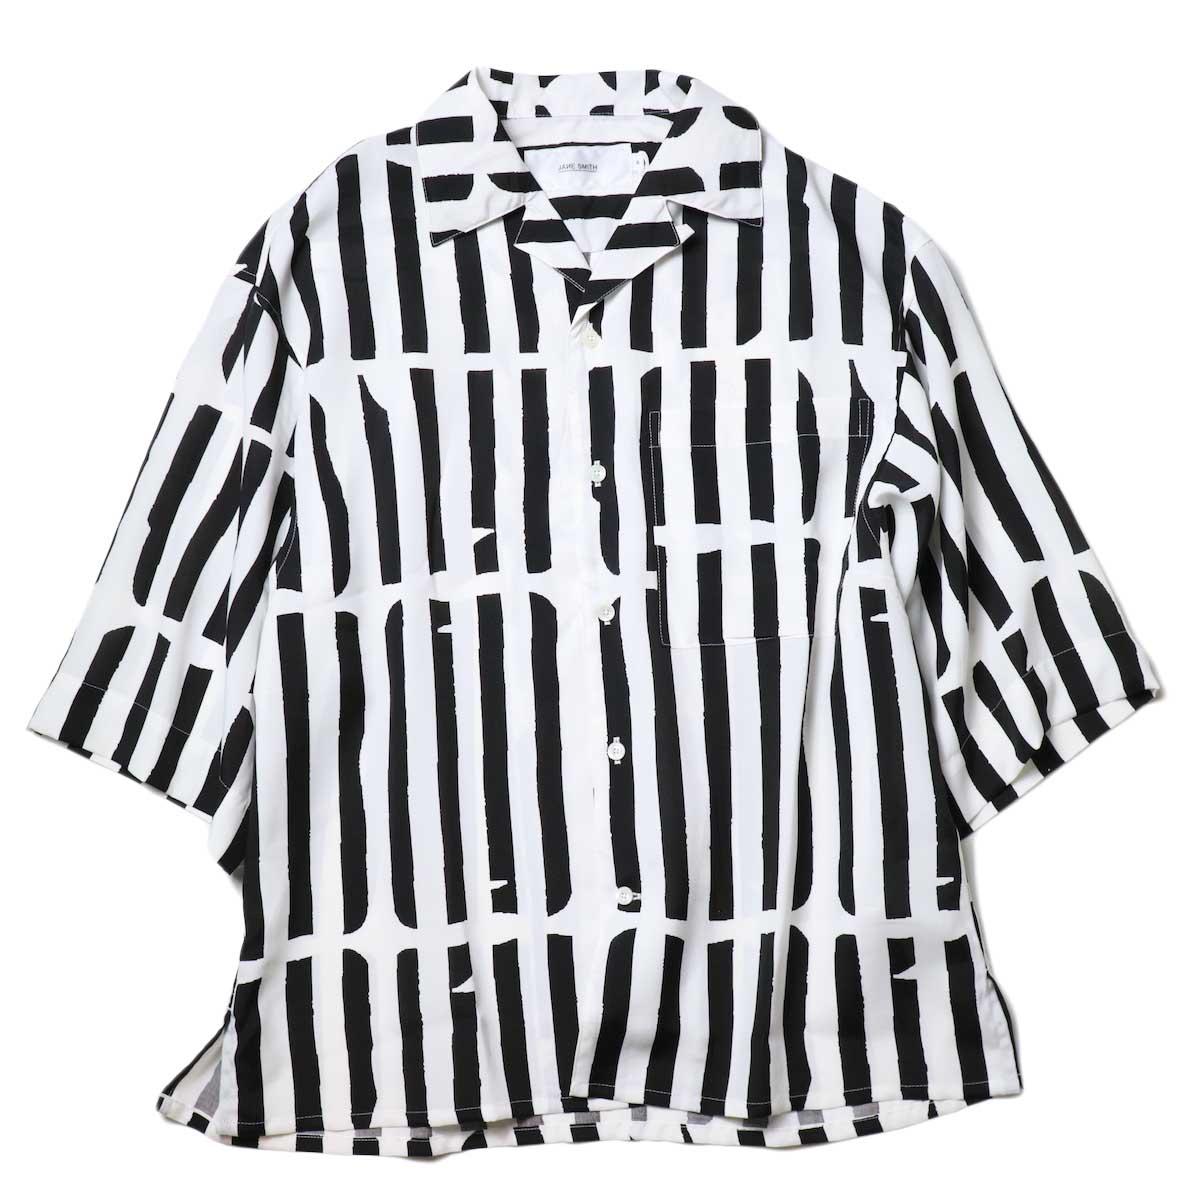 JANE SMITH / OPEN COLLAR SHIRTS S/S (White Black)